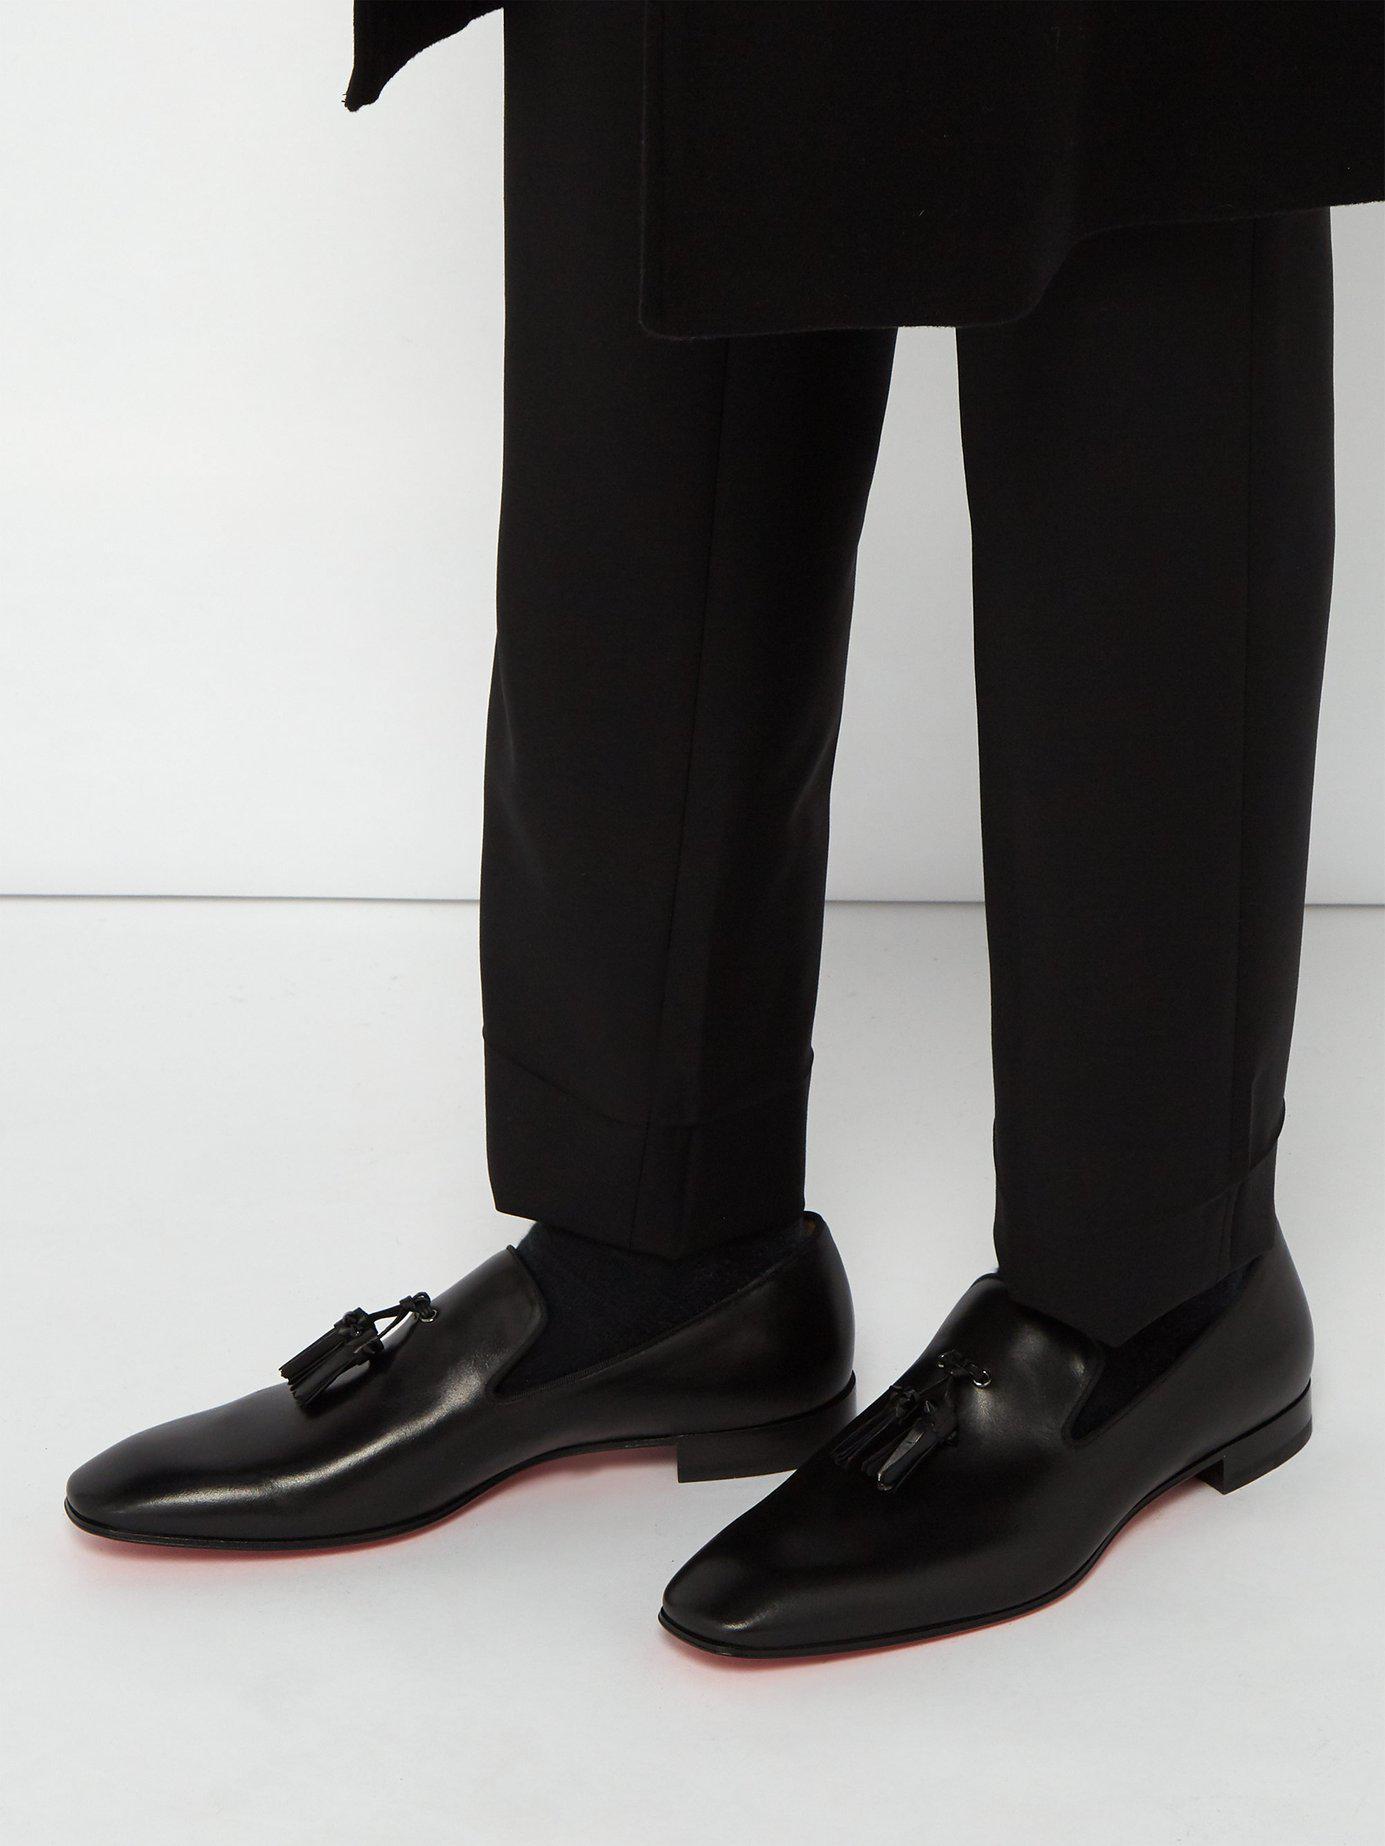 04808e96171 Lyst - Christian Louboutin Dandelion Tassel Embellished Leather Loafer in  Black for Men